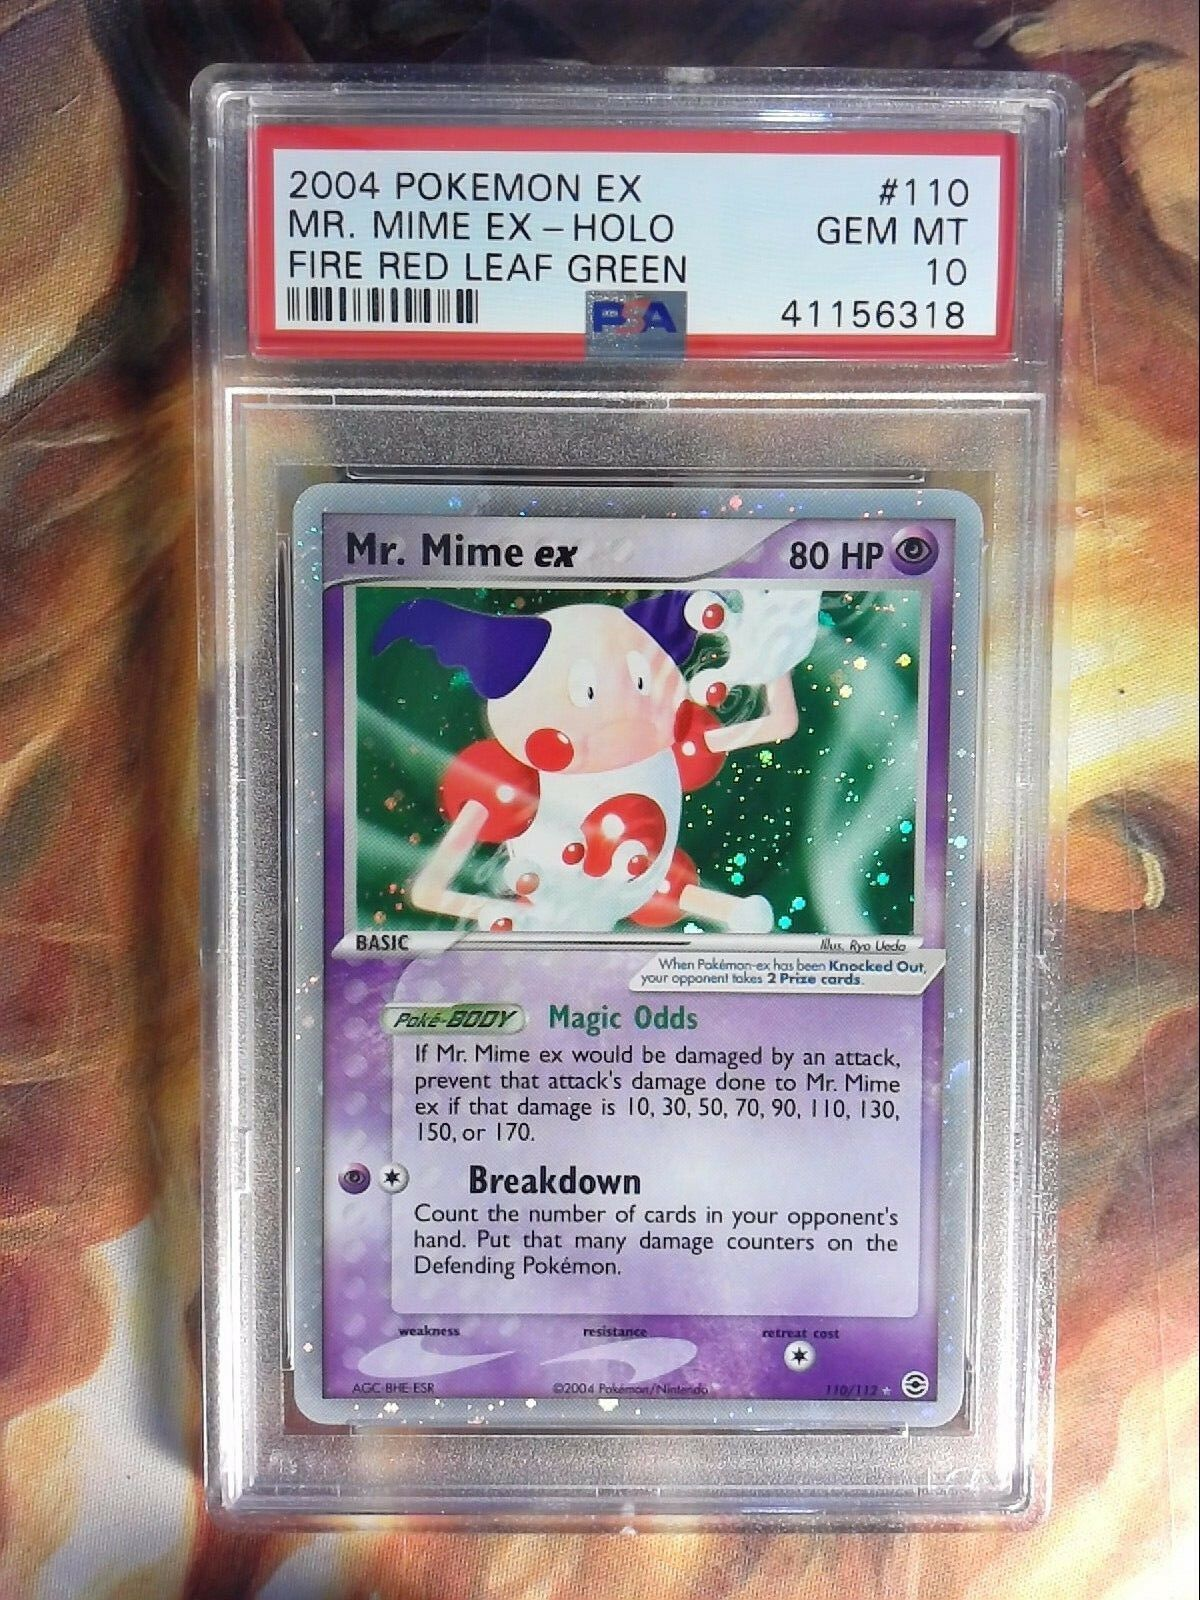 2004 Pokemon EX Fire Red Leaf Green 110 110 110 Mr. Mime EX-Holo PSA 10 Gem Mint Card 152da9